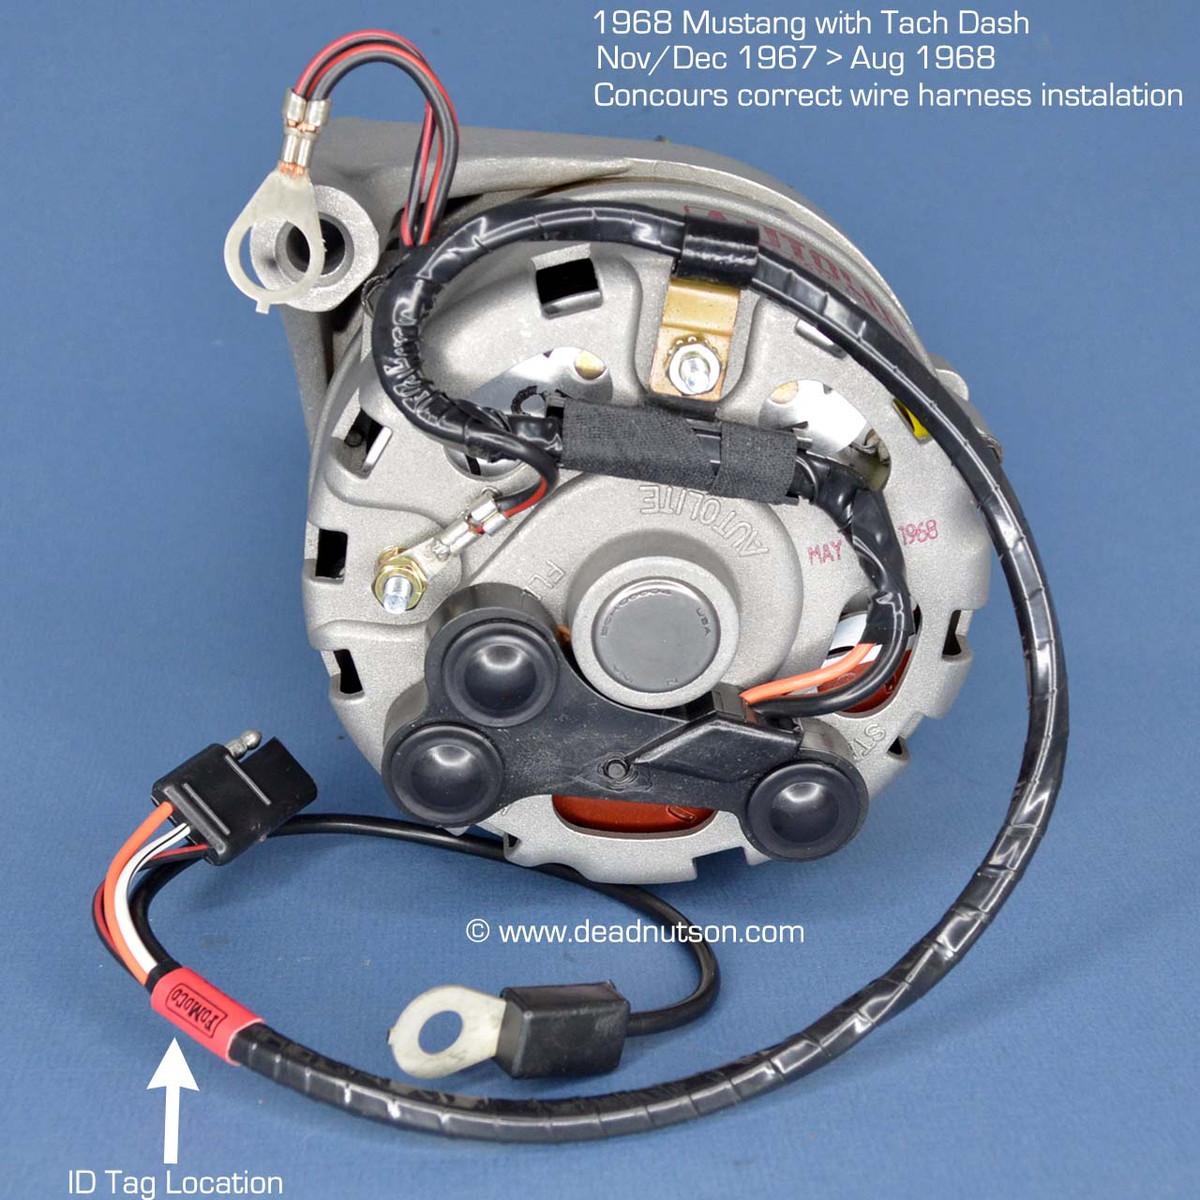 1968 ford mustang alternator wiring harness - wiring diagram  side-silverado-a - side-silverado-a.disnar.it  disnar.it